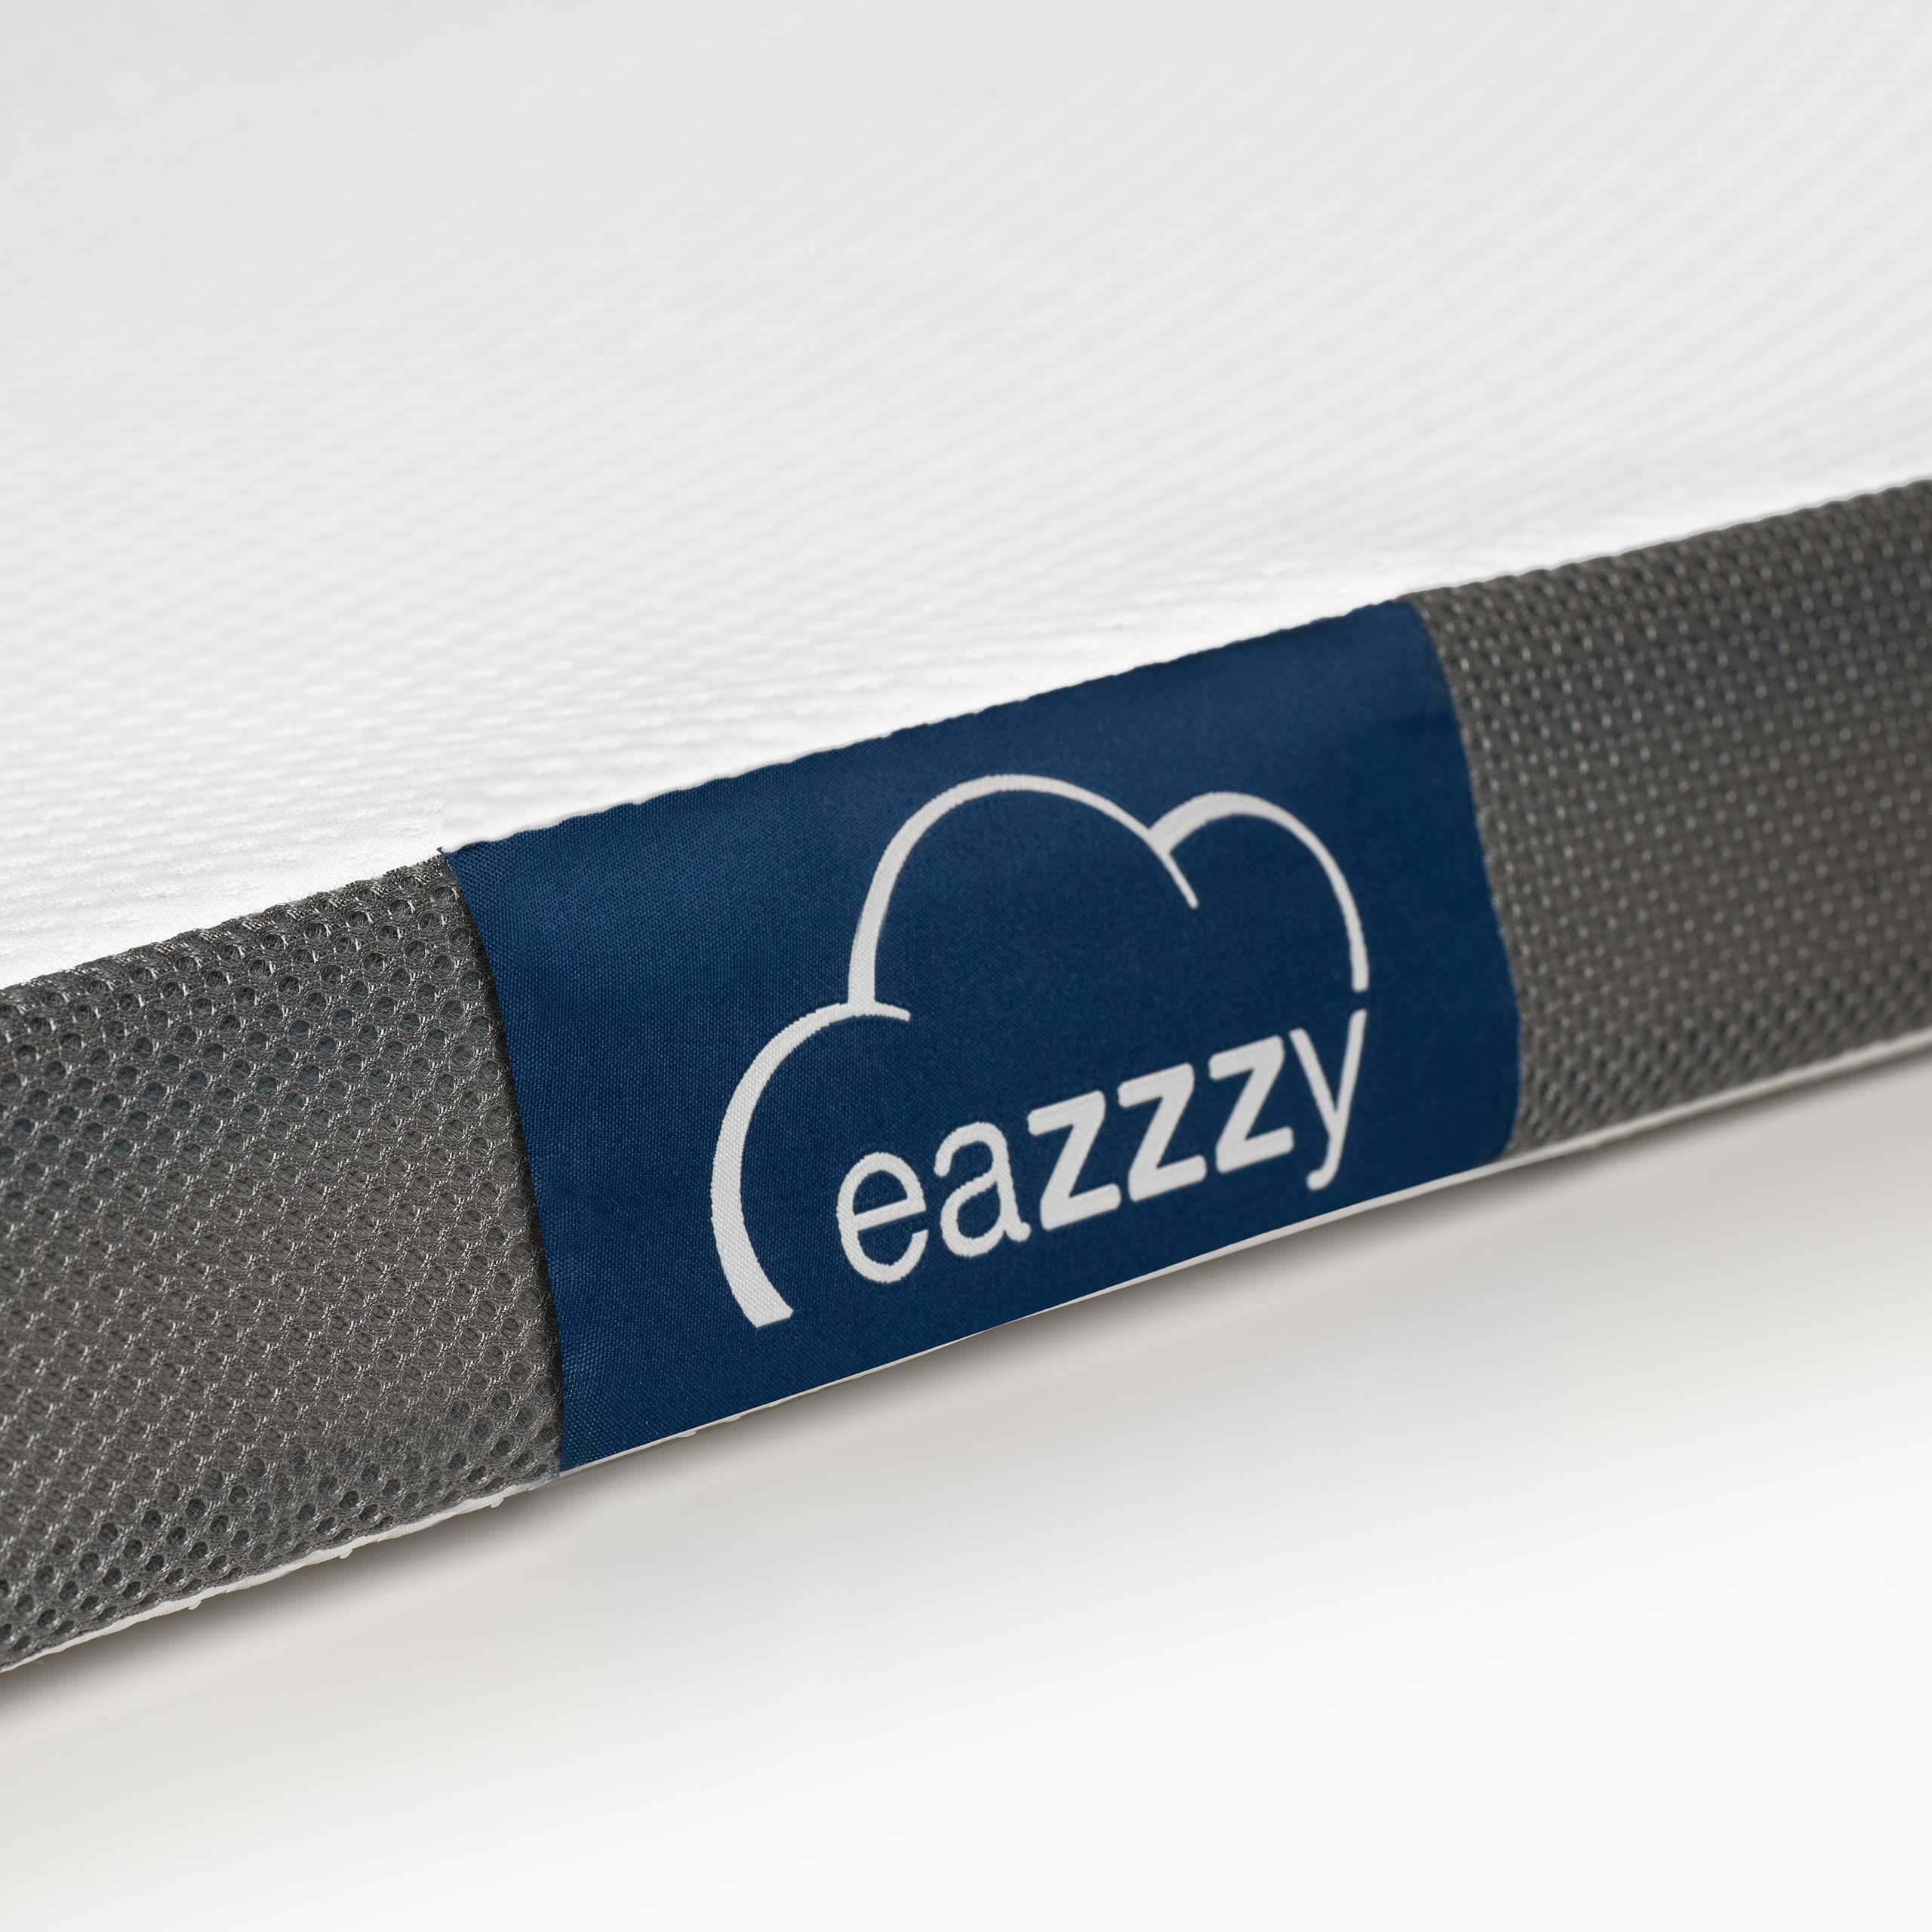 Genius eazzzyMatratzentopper 120 x 200 cmMatratzenauflageBekannt aus TV